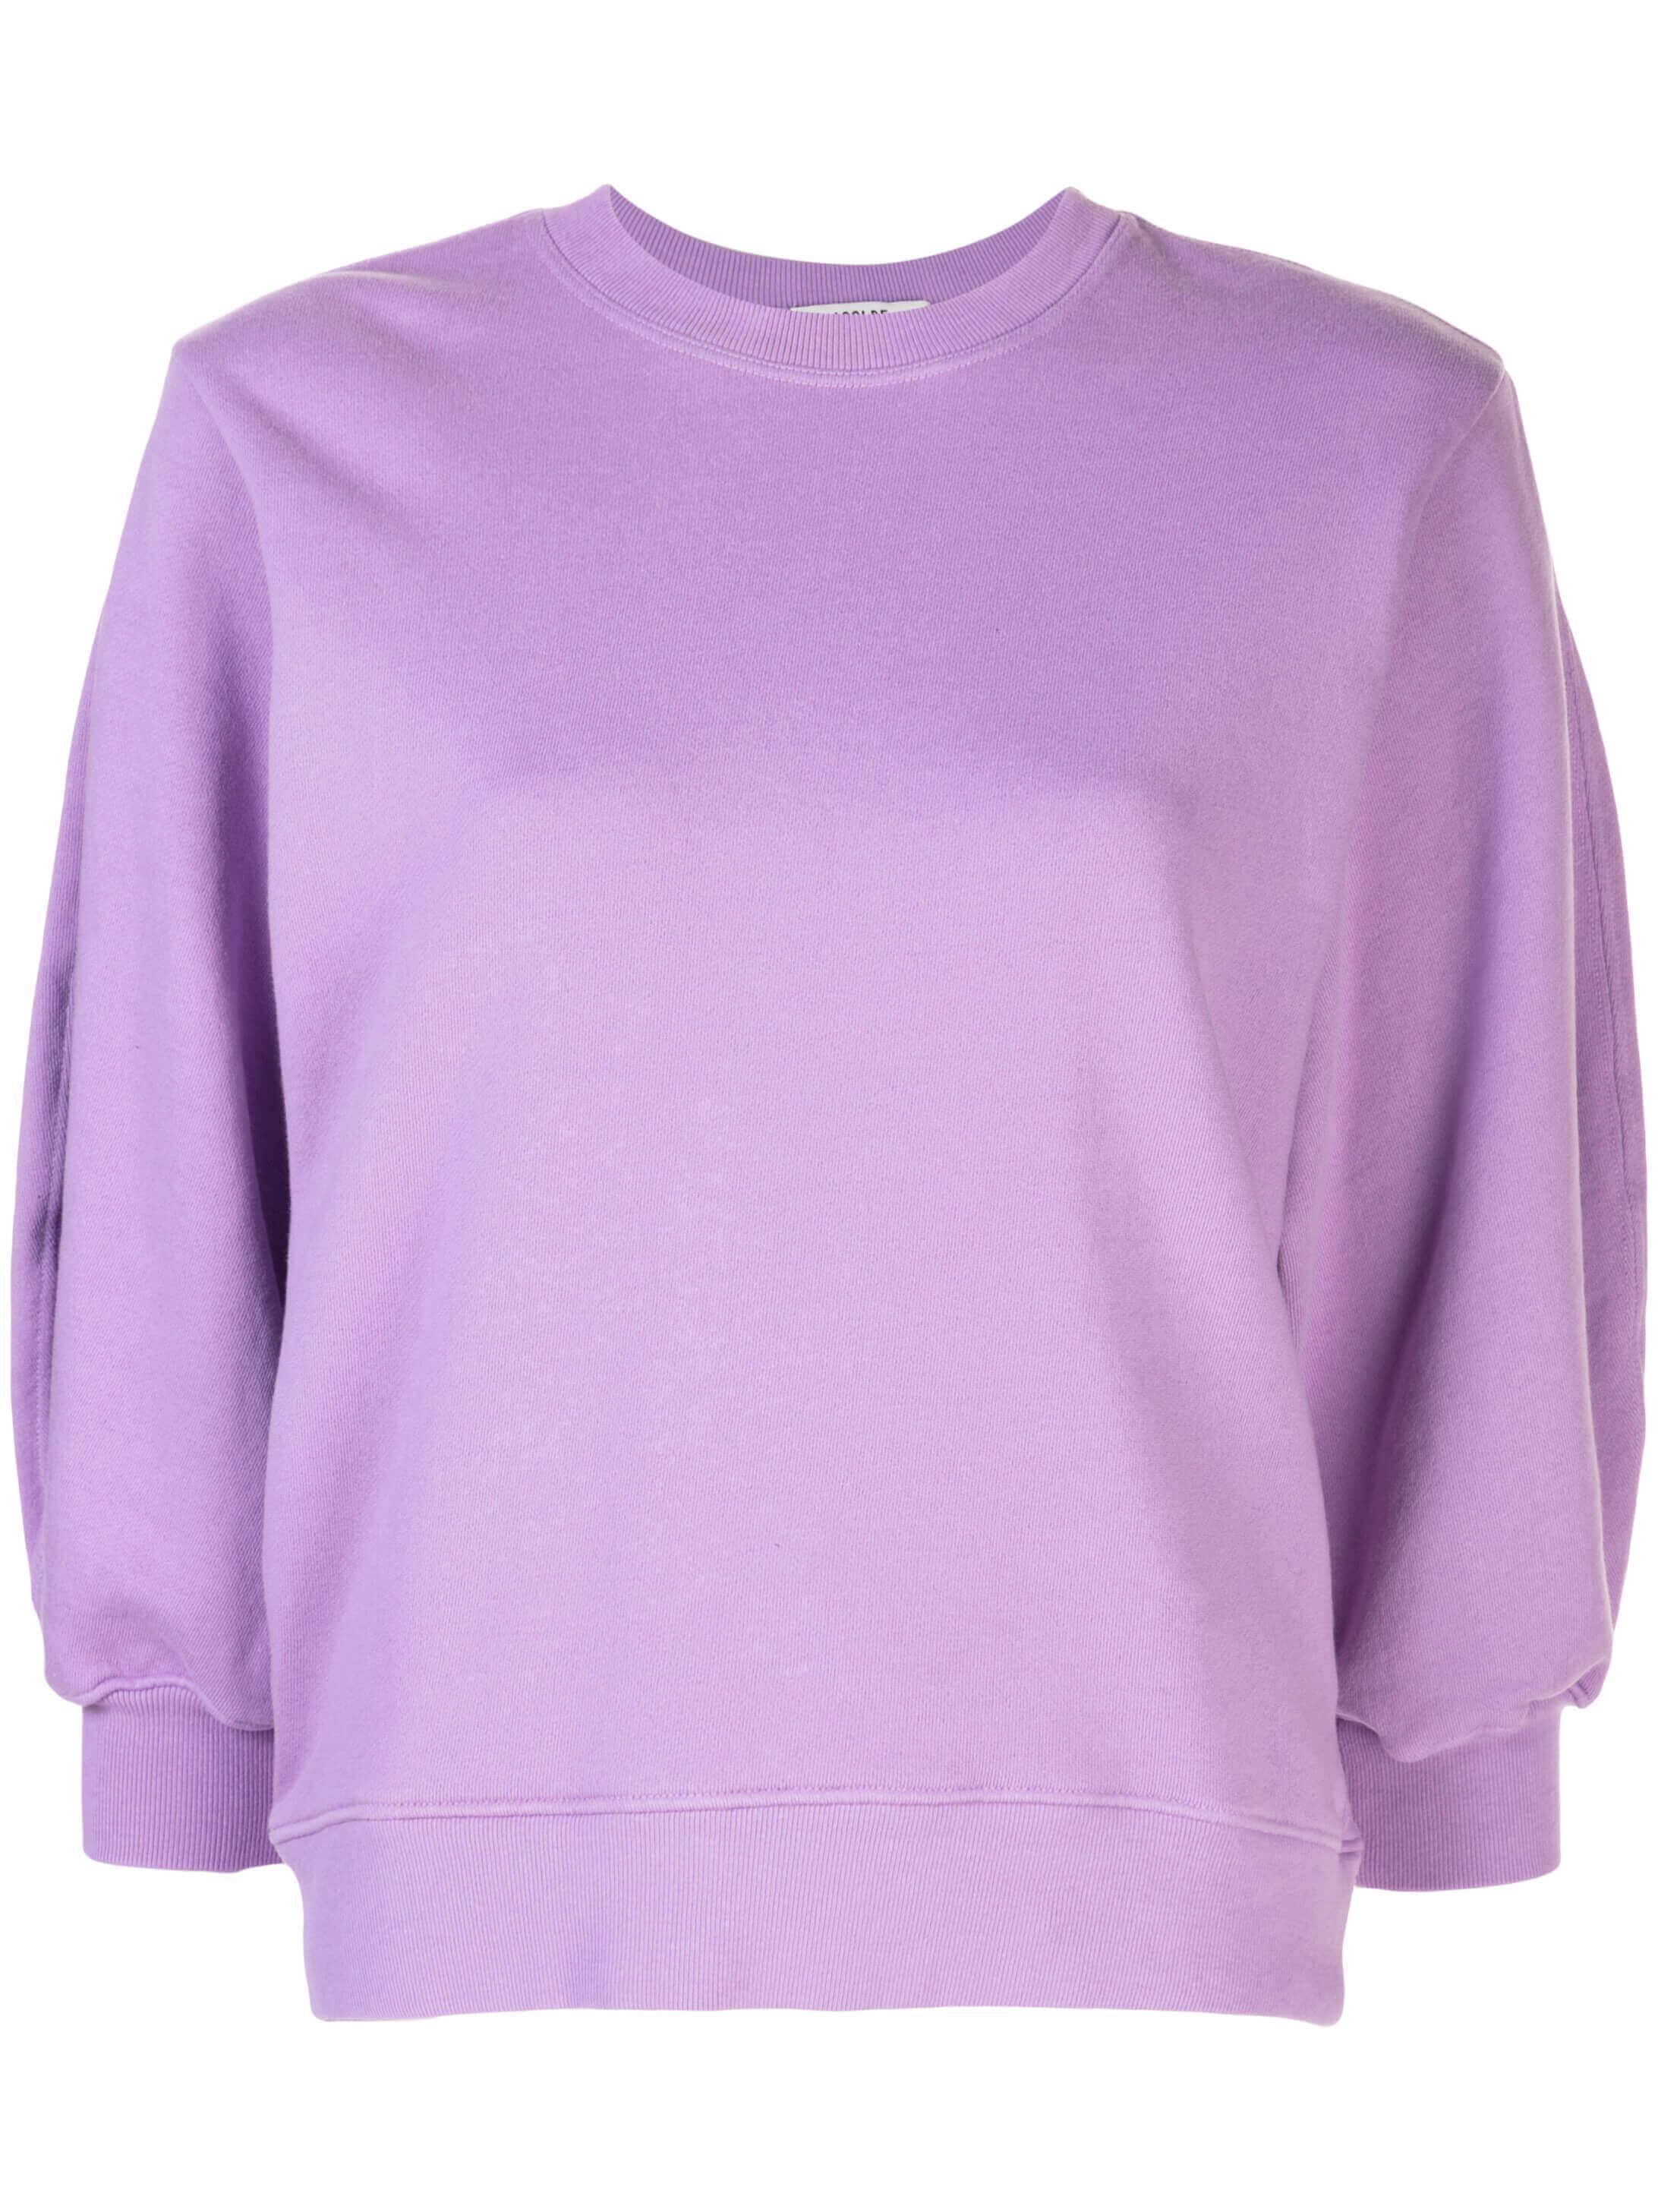 Thora 3/4 Sleeve Sweatshirt Crew Neck